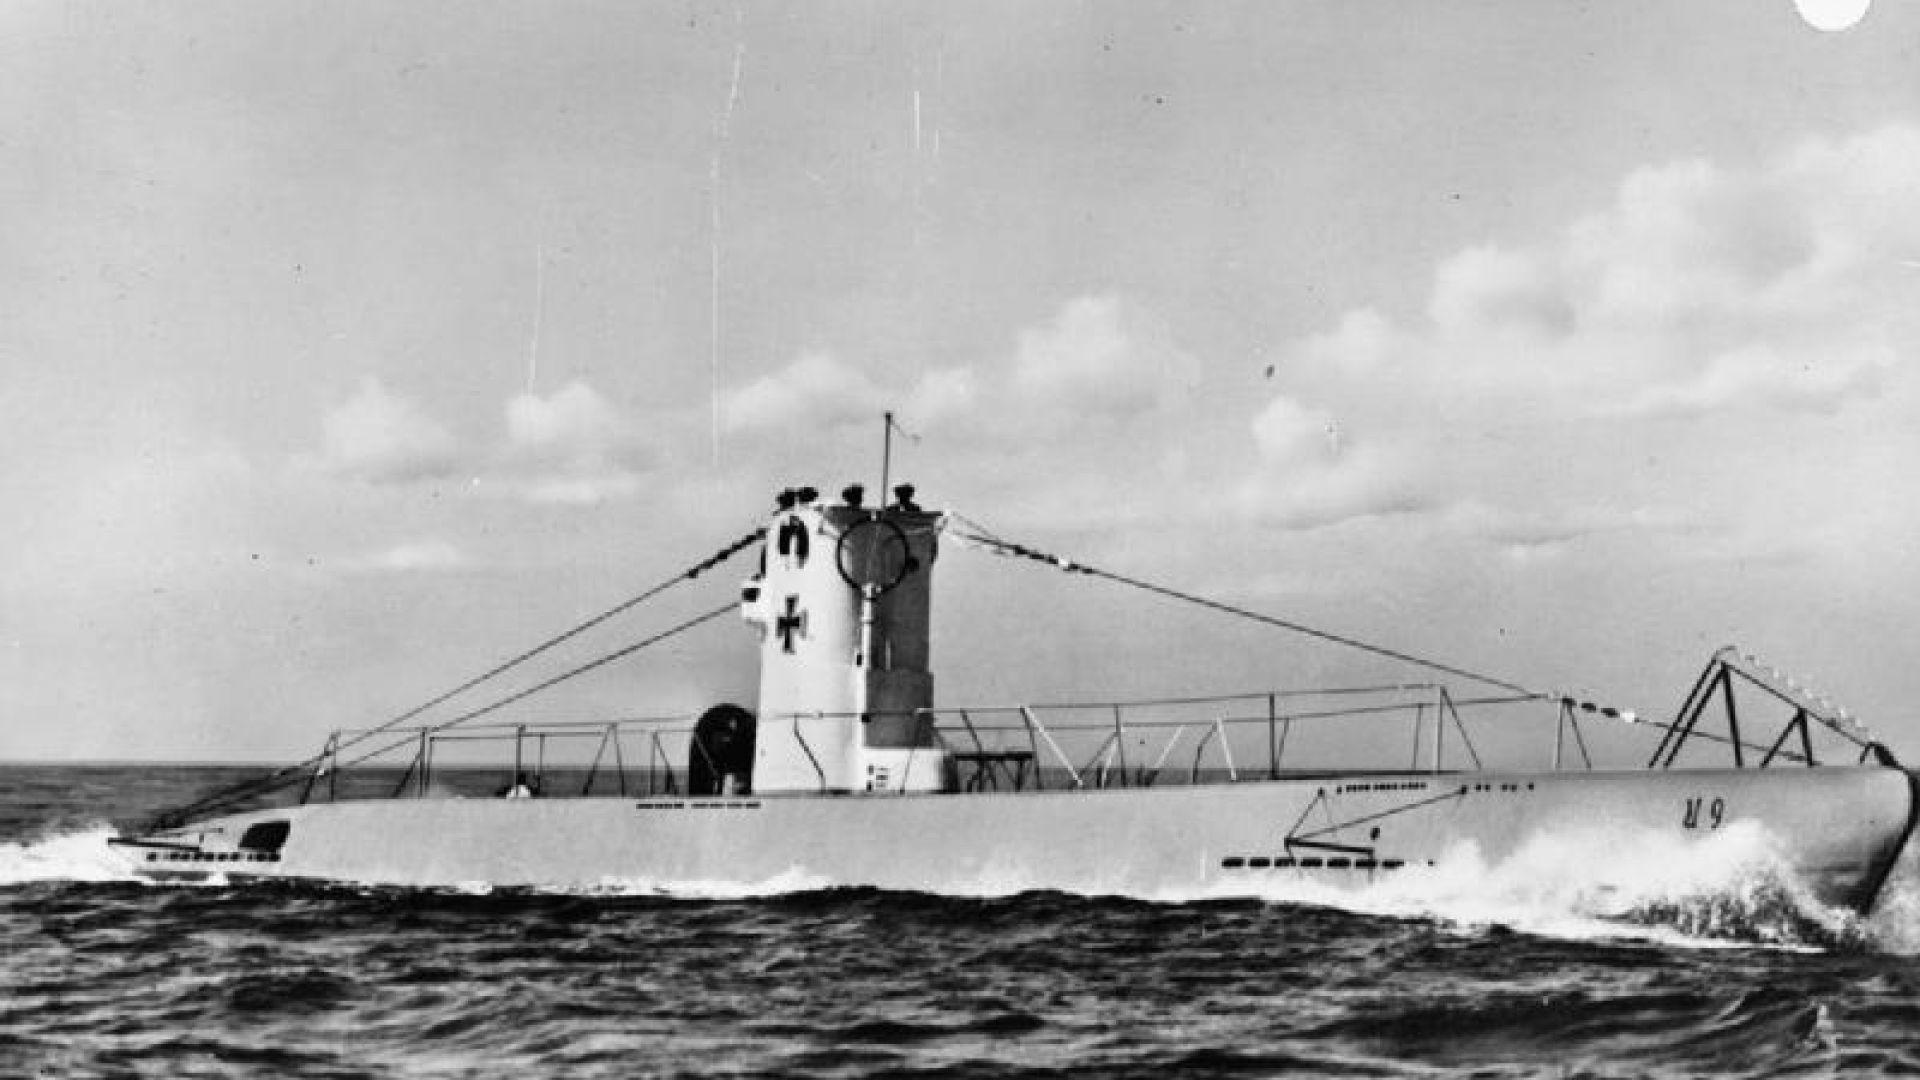 Турски изследователи откриха германска подводница, потопена по време на Втората